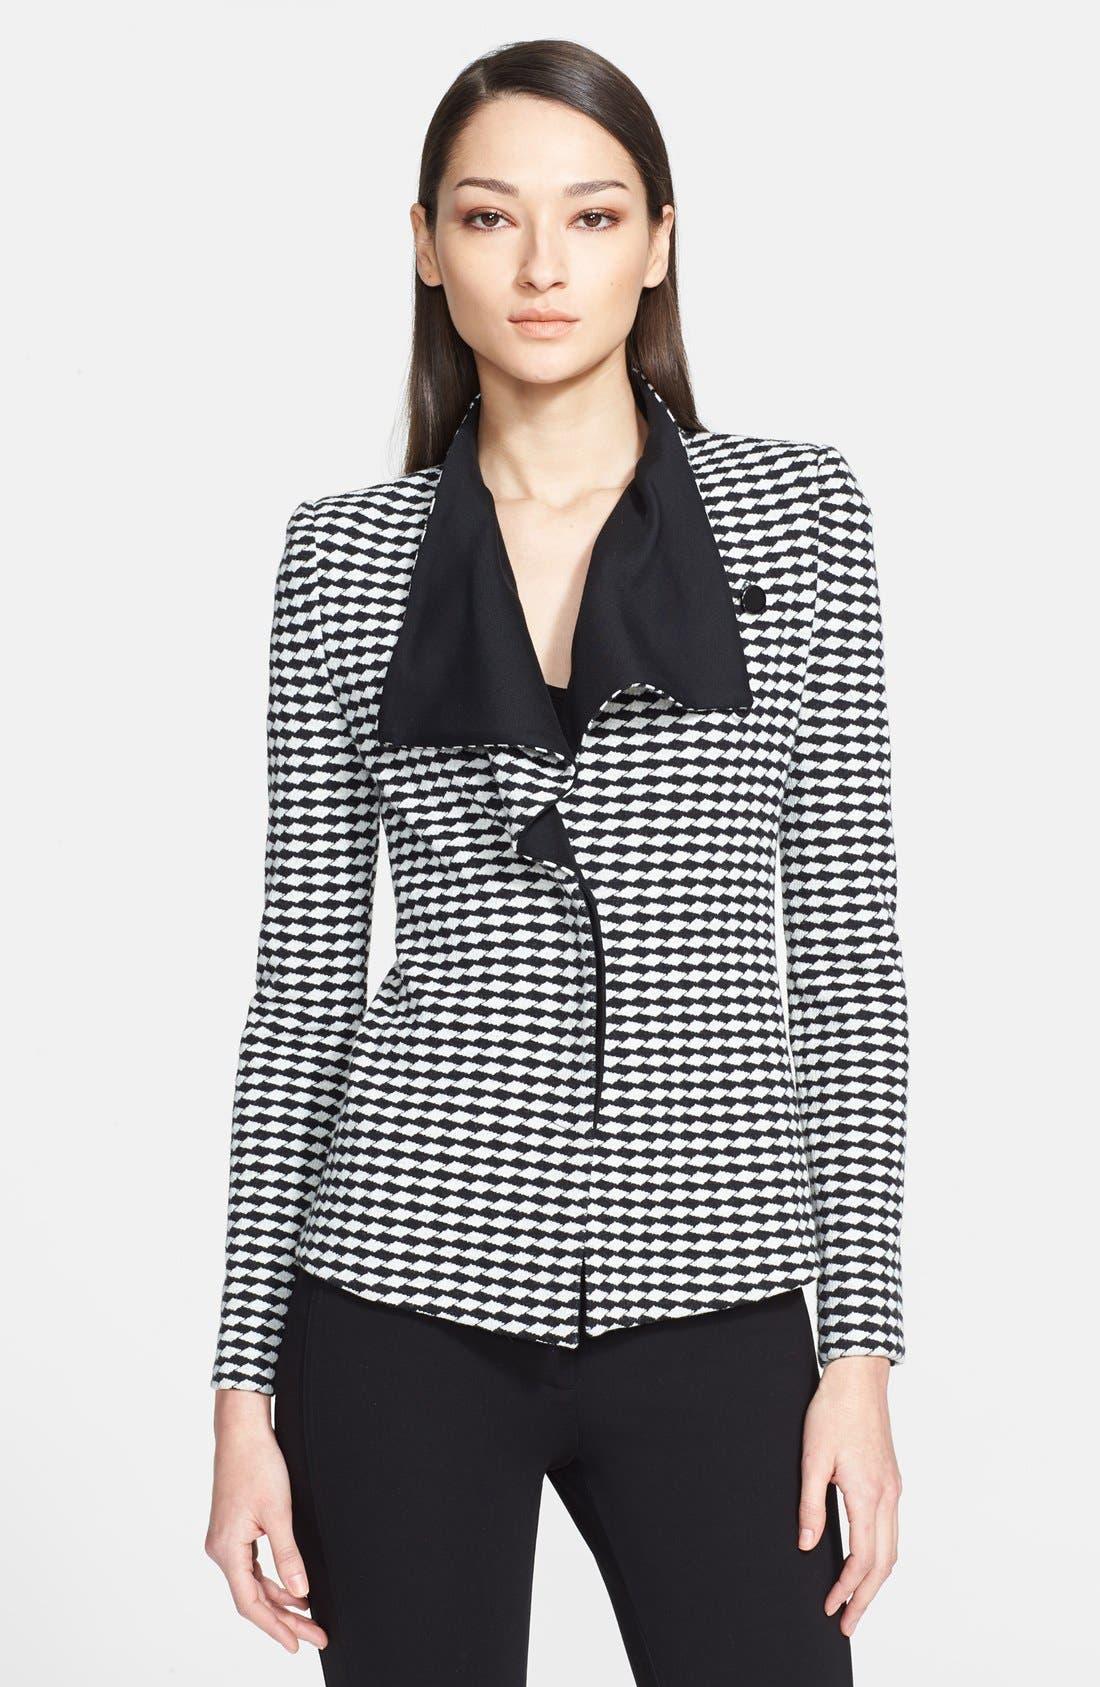 Alternate Image 1 Selected - Armani Collezioni Asymmetrical Jacquard Jersey Jacket